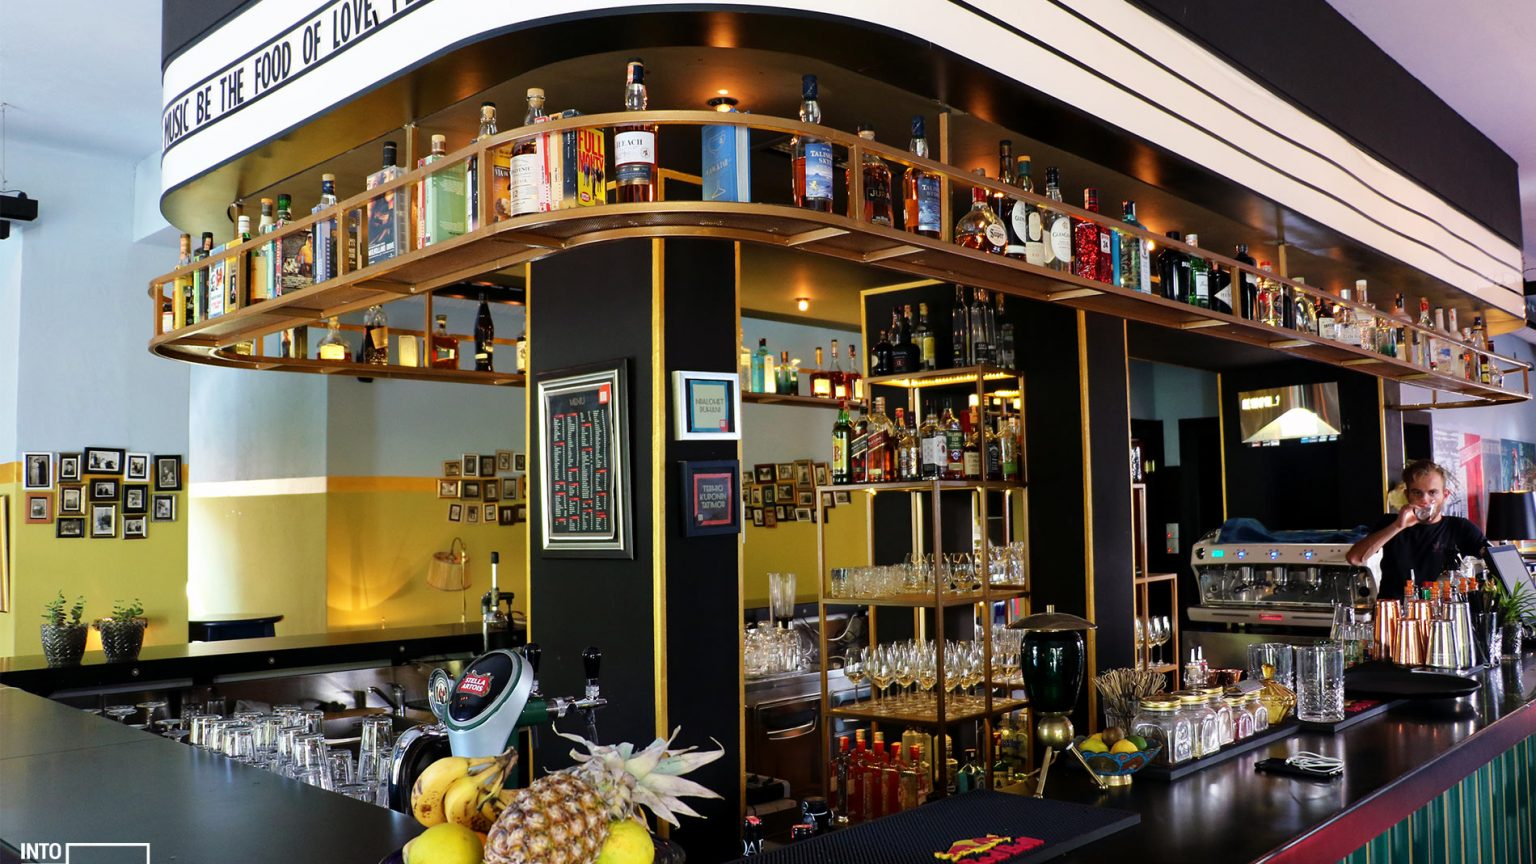 Kino bar counter, photo by IntoAlbania.